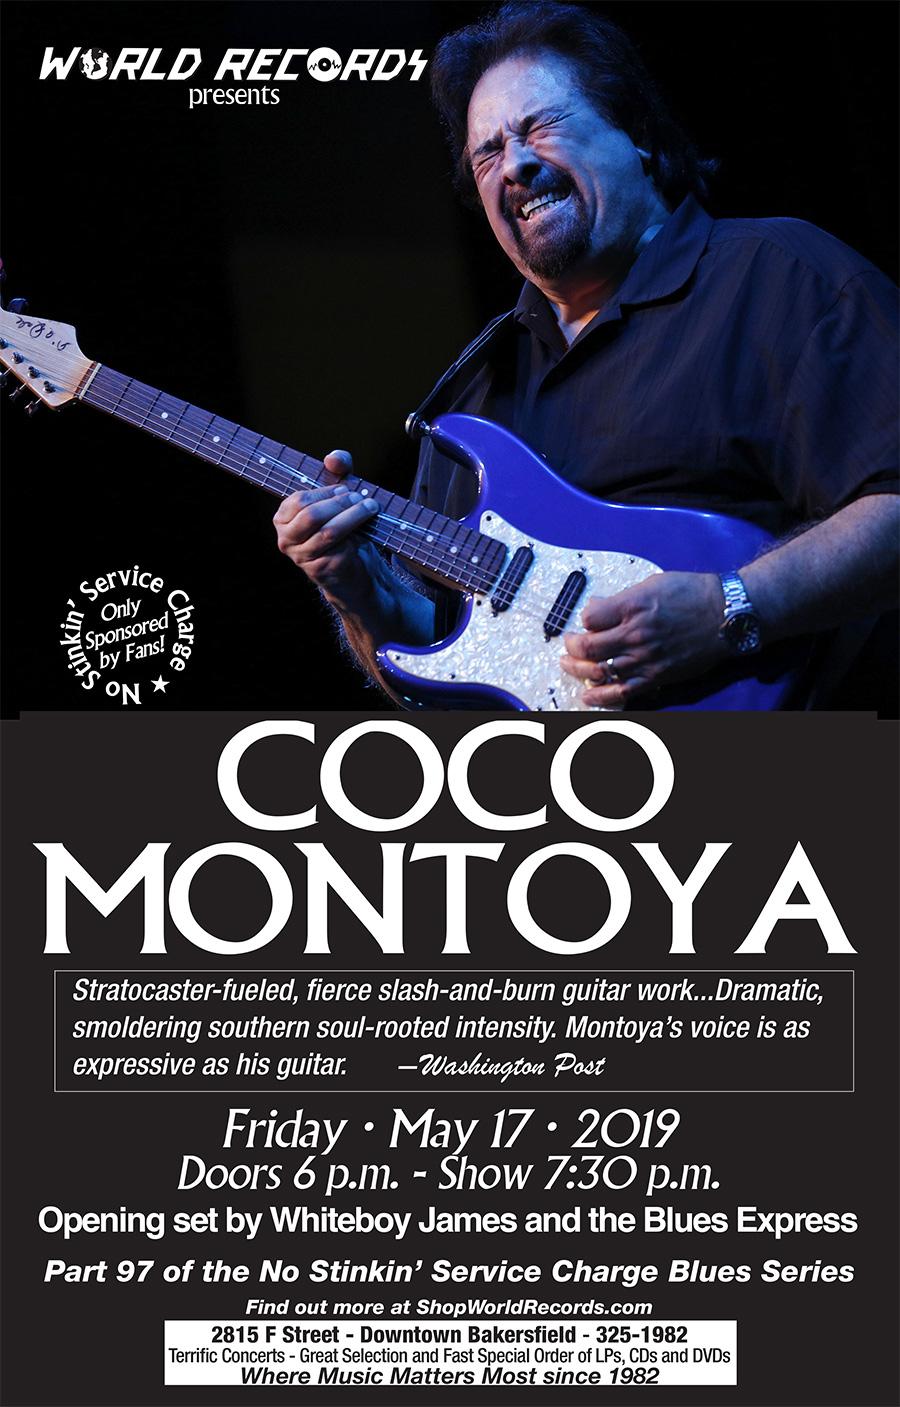 World Records - Coco Montoya